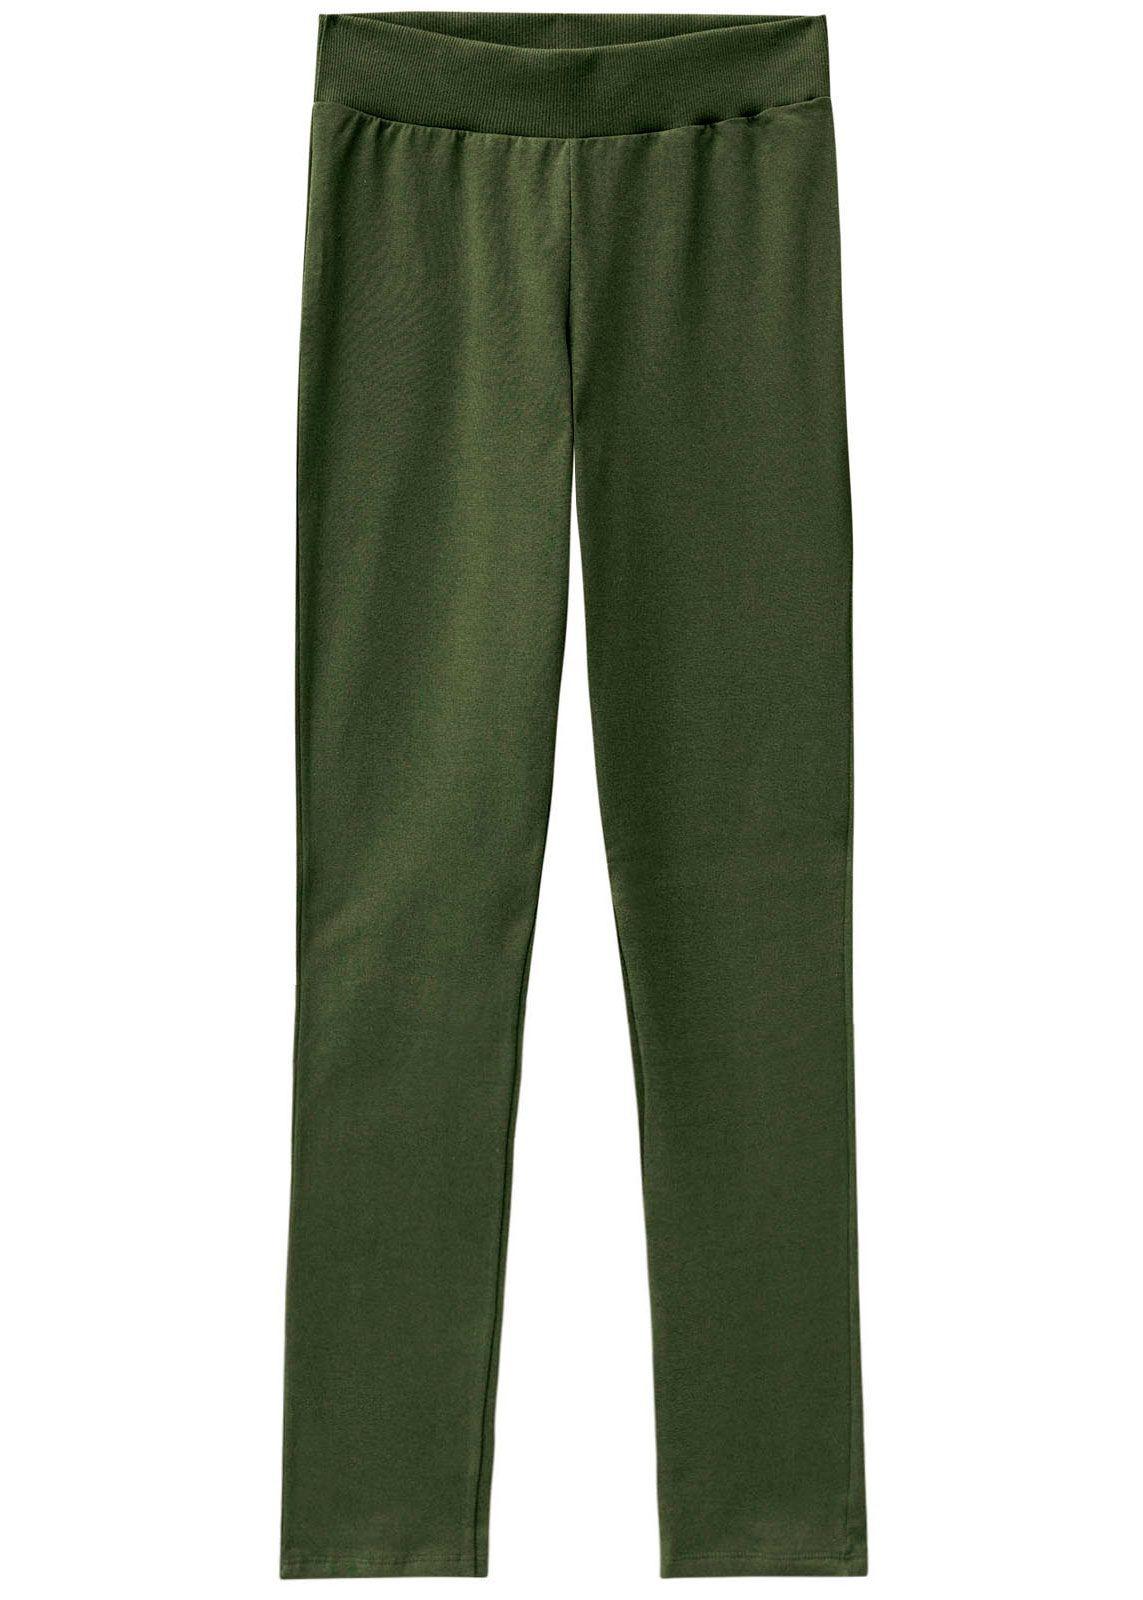 Calça Feminina Adulto Inverno Verde Malwee